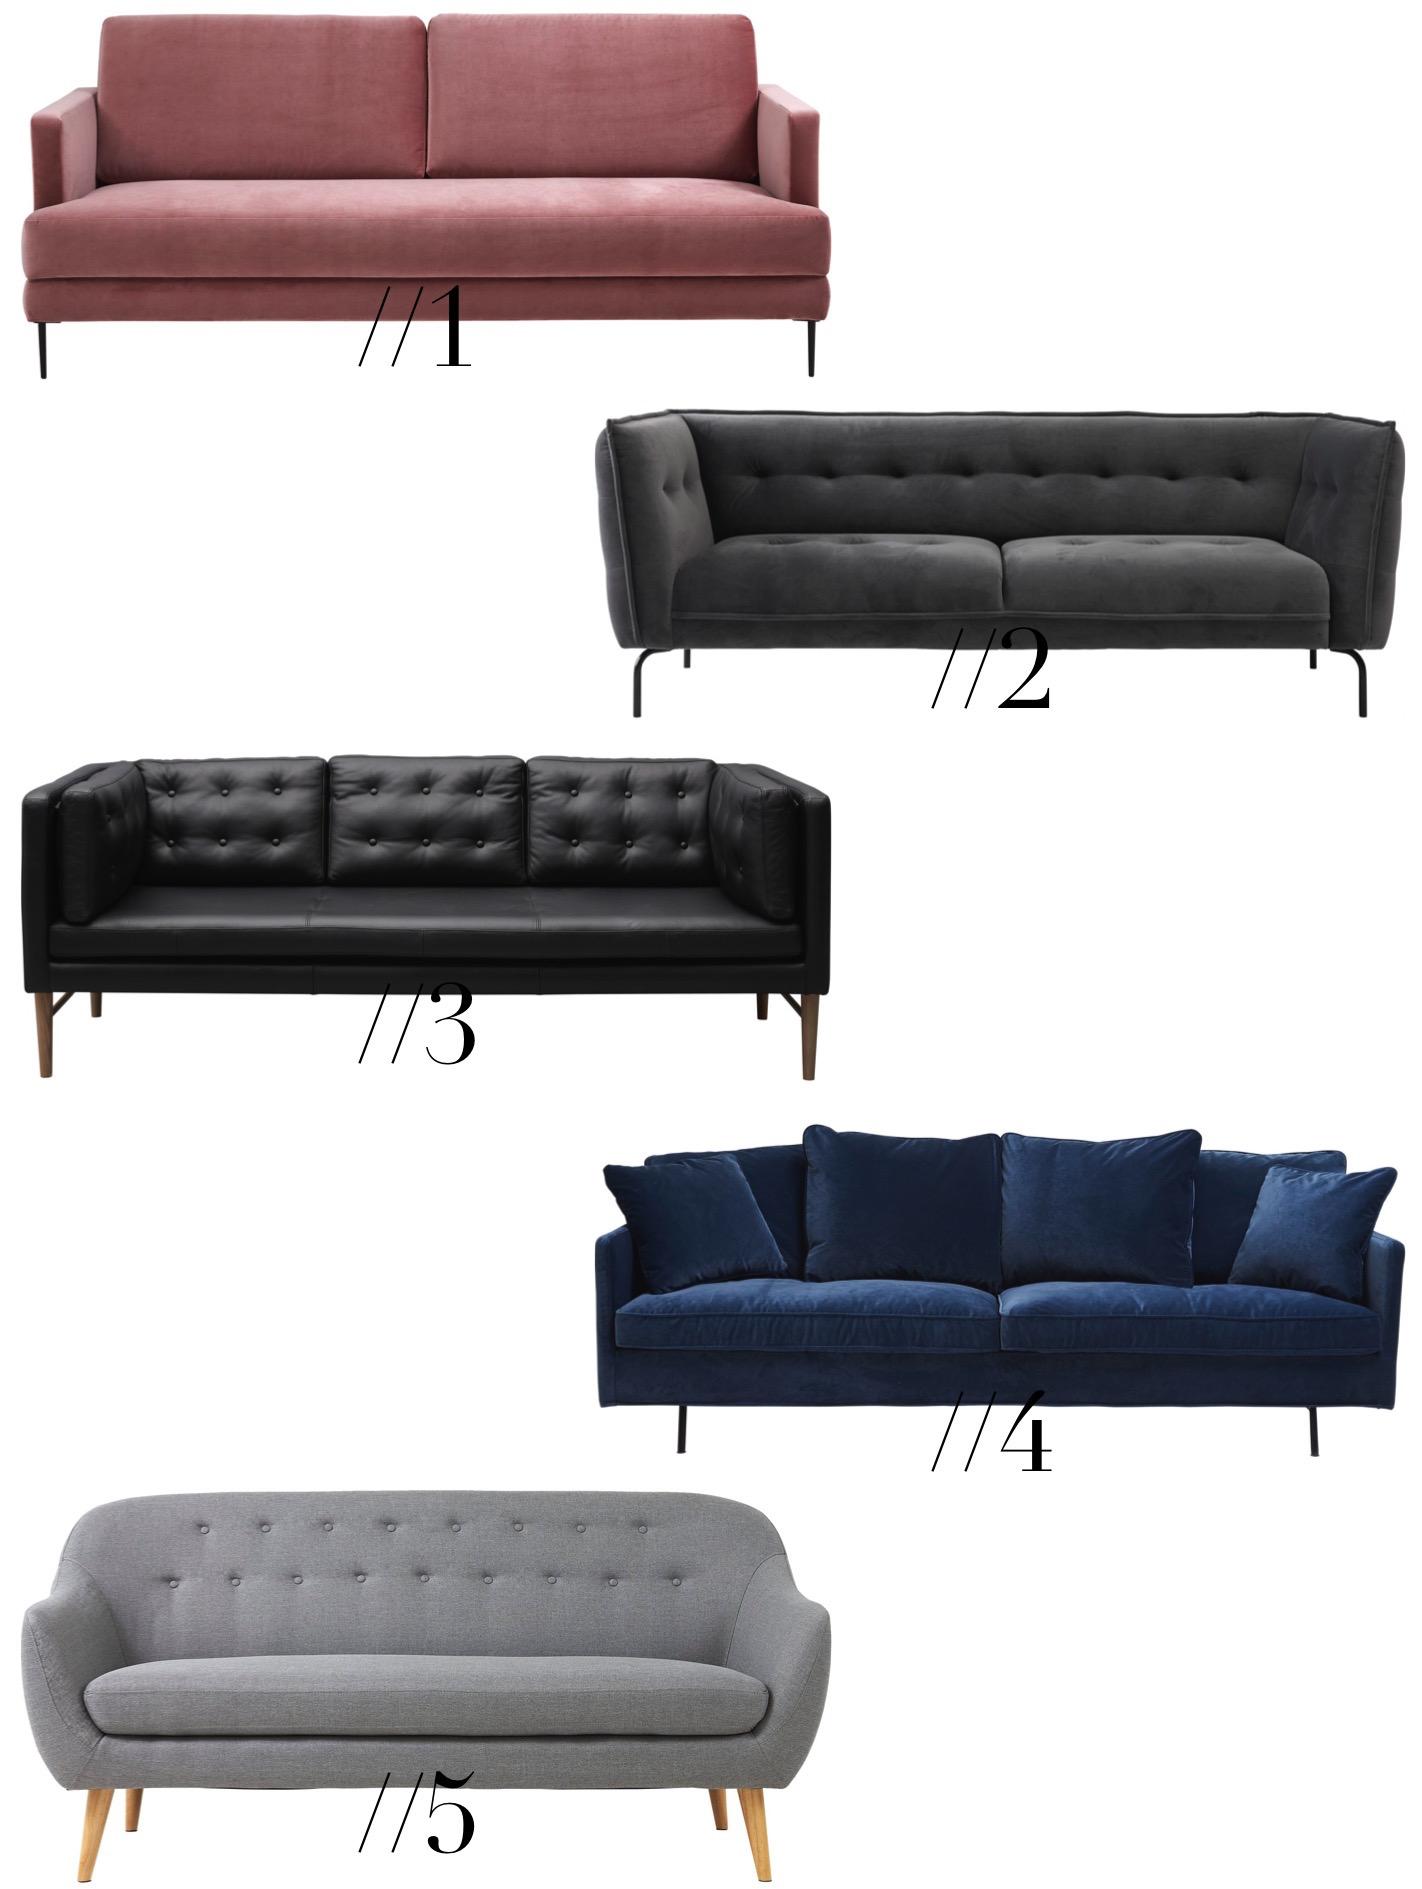 homesick-ilva-sofa